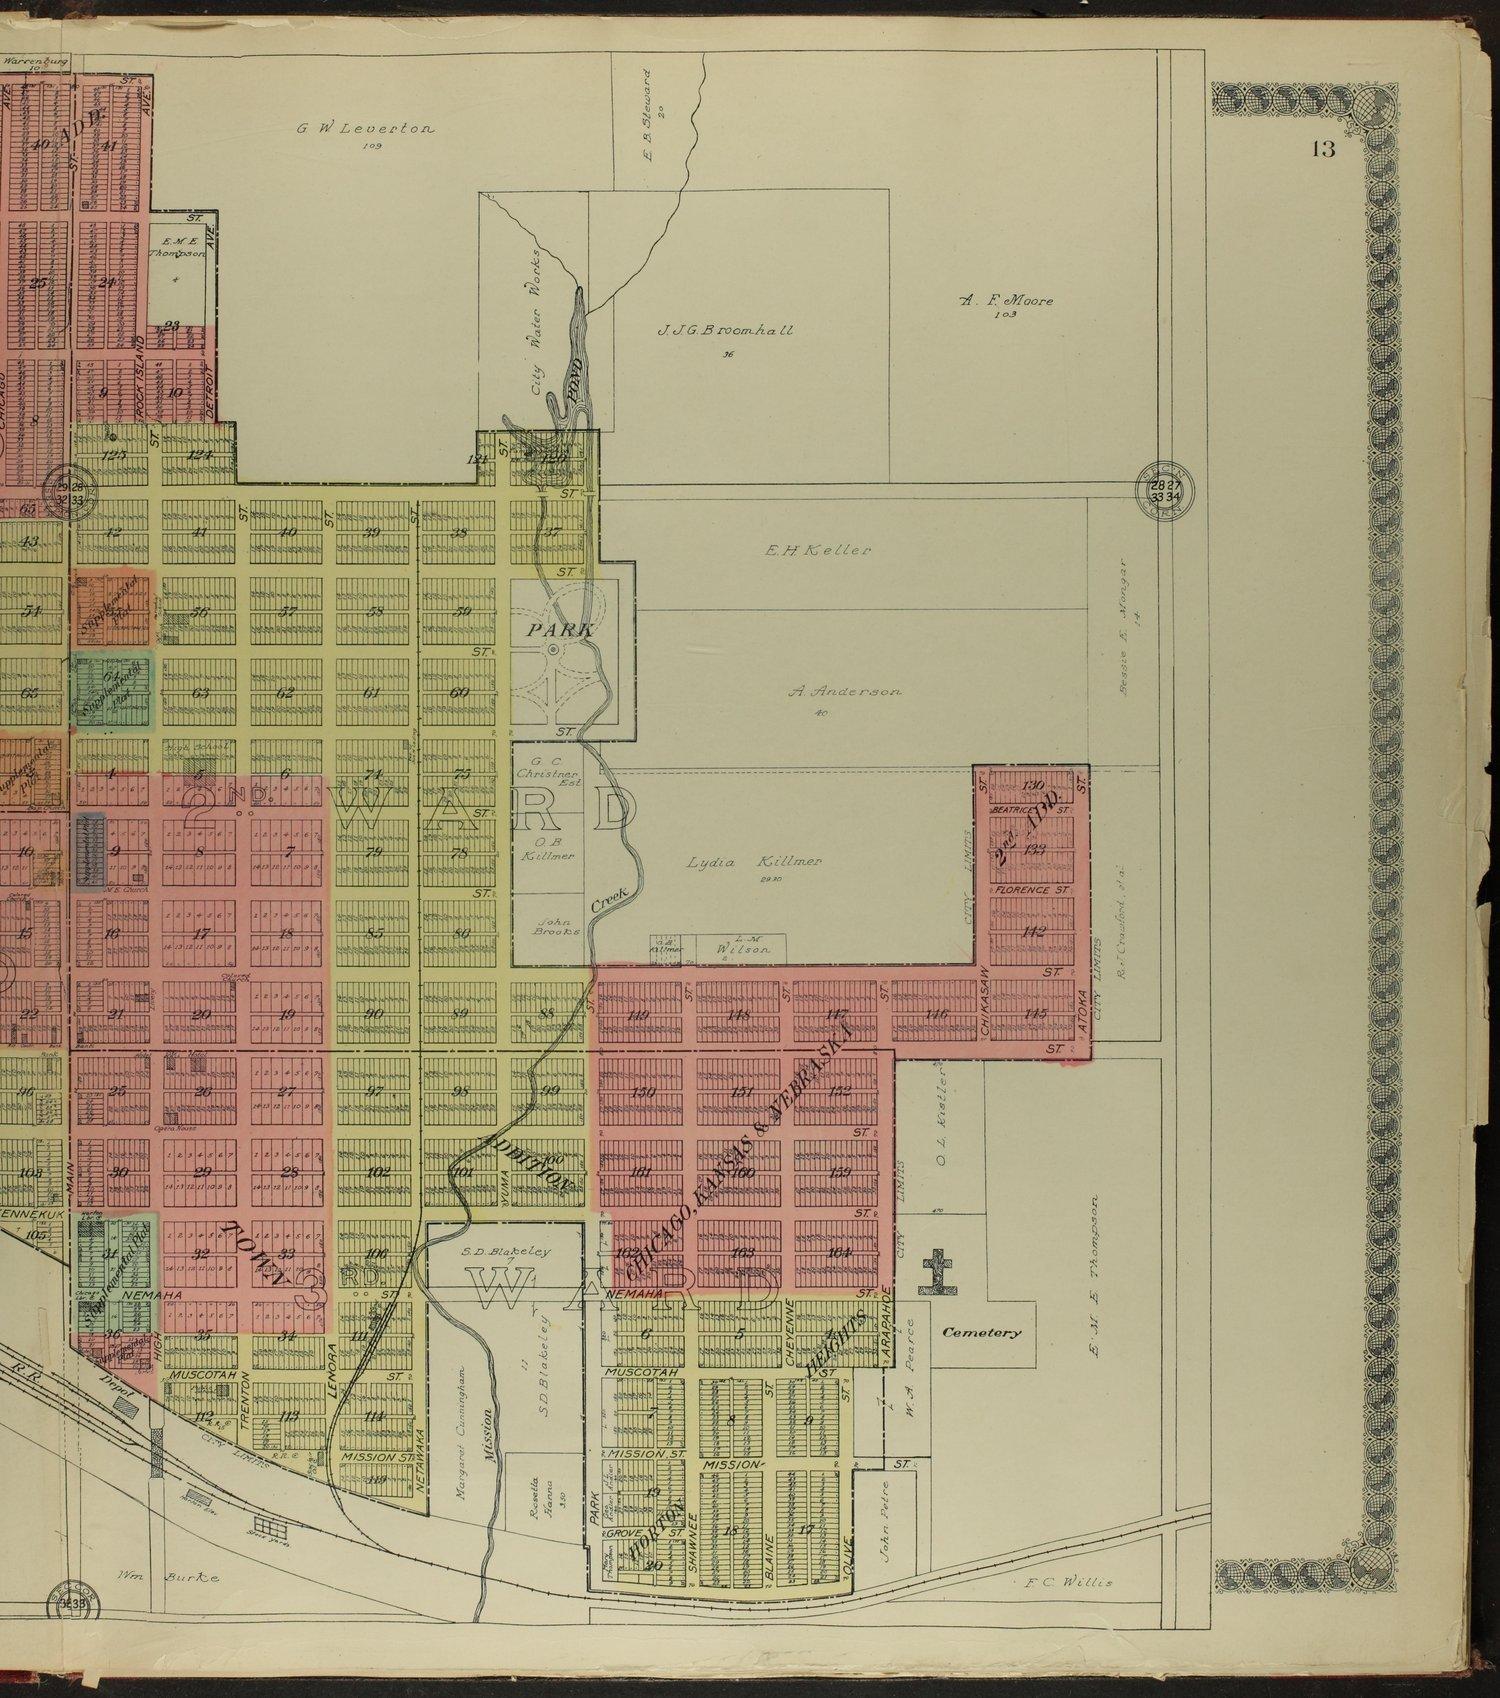 Standard atlas of Brown County, Kansas - 13